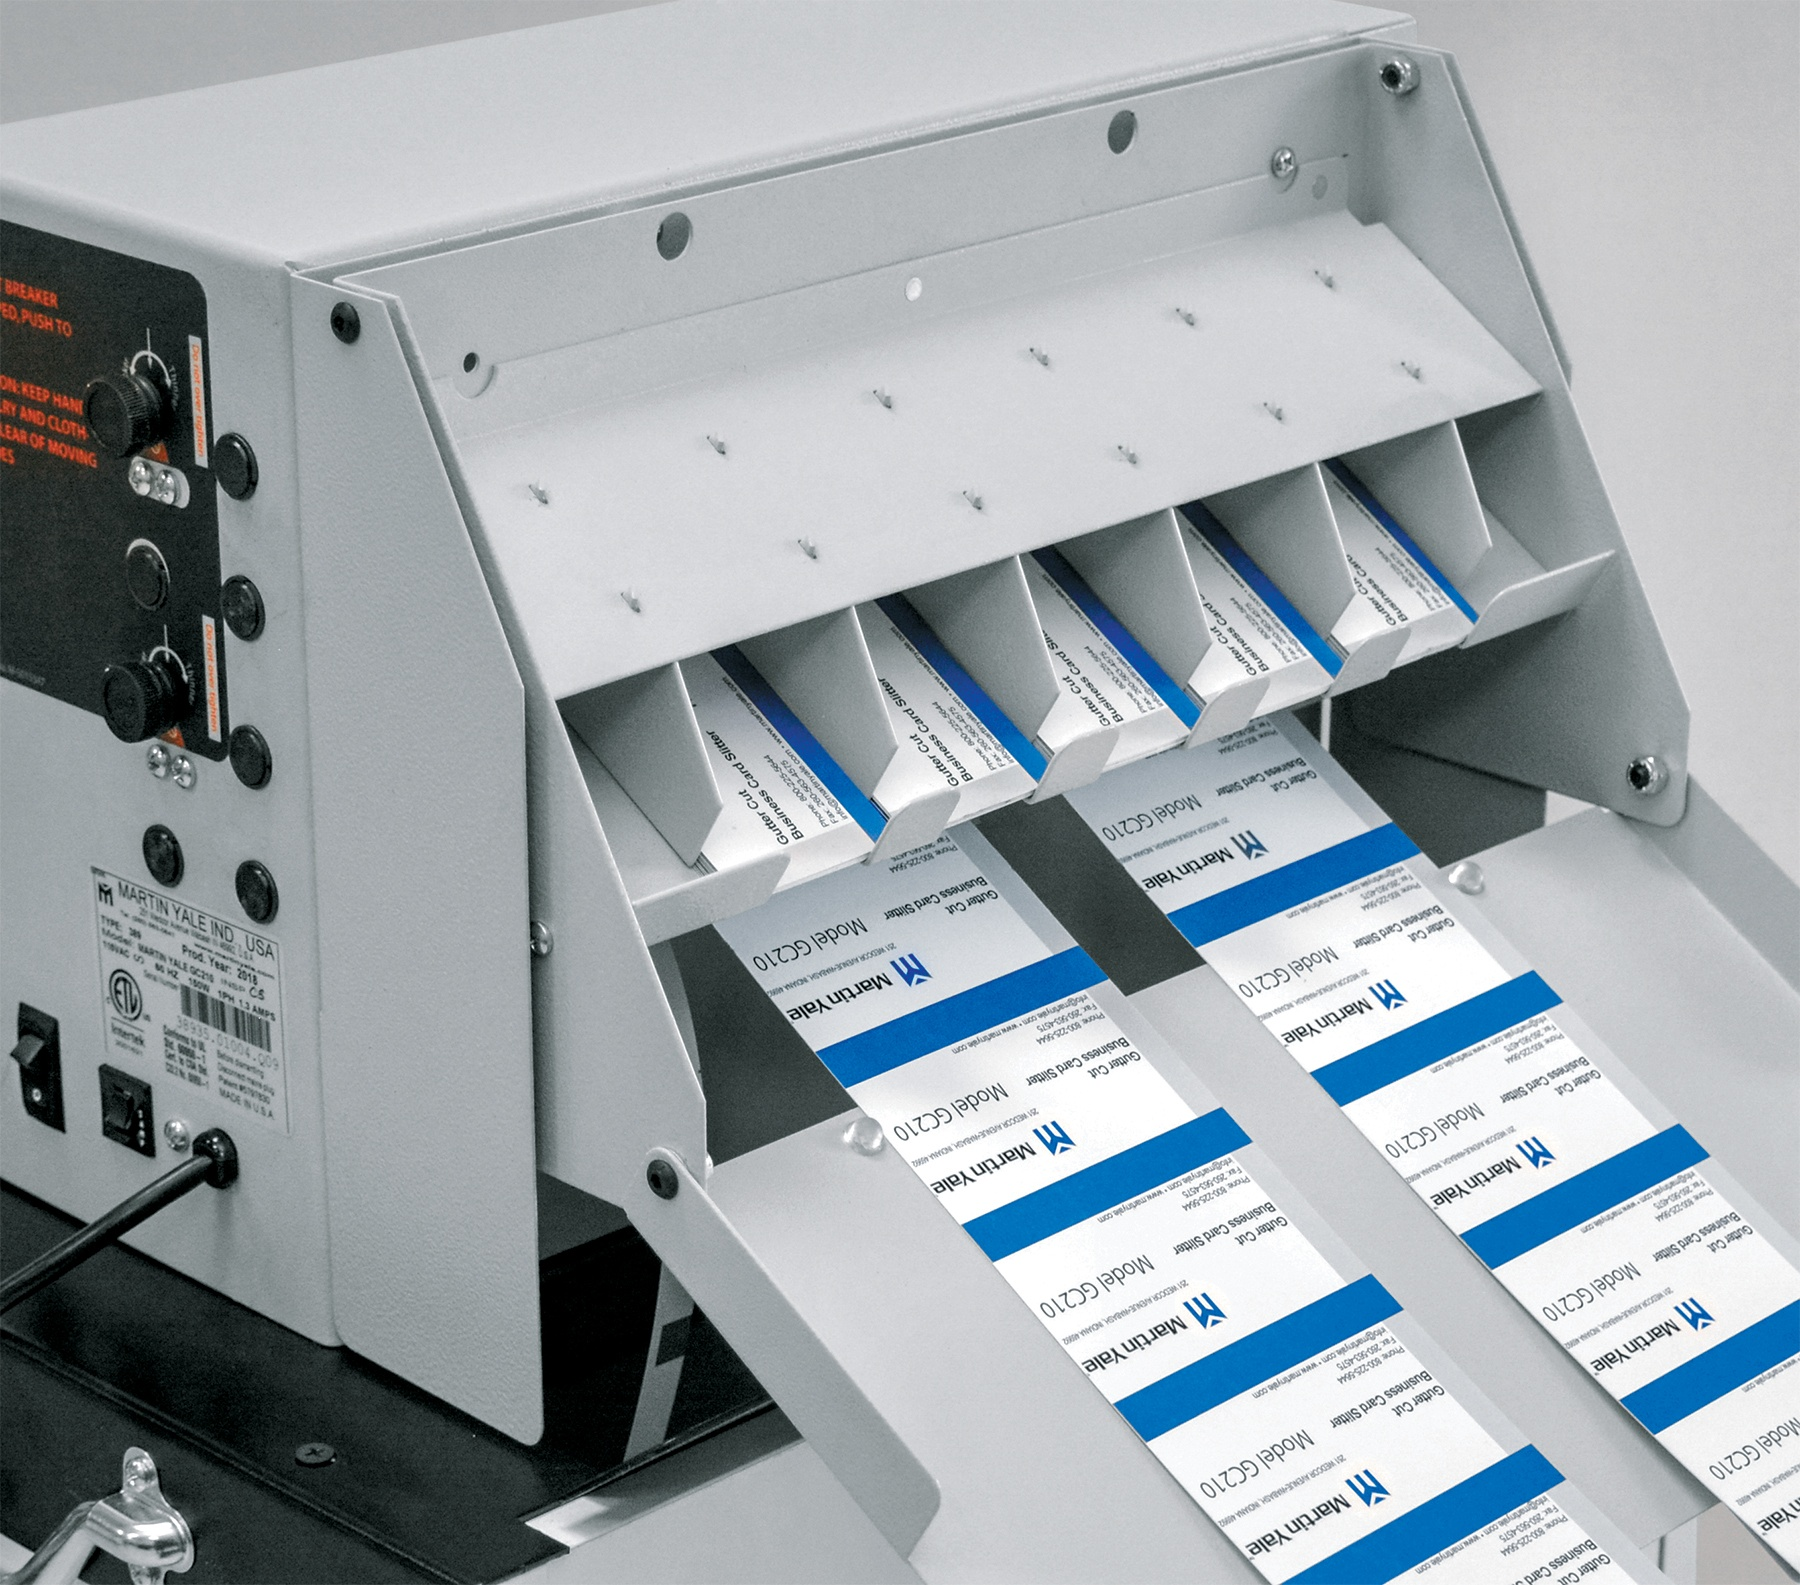 GC210 Desktop Business Card Slitter - Martin Yale